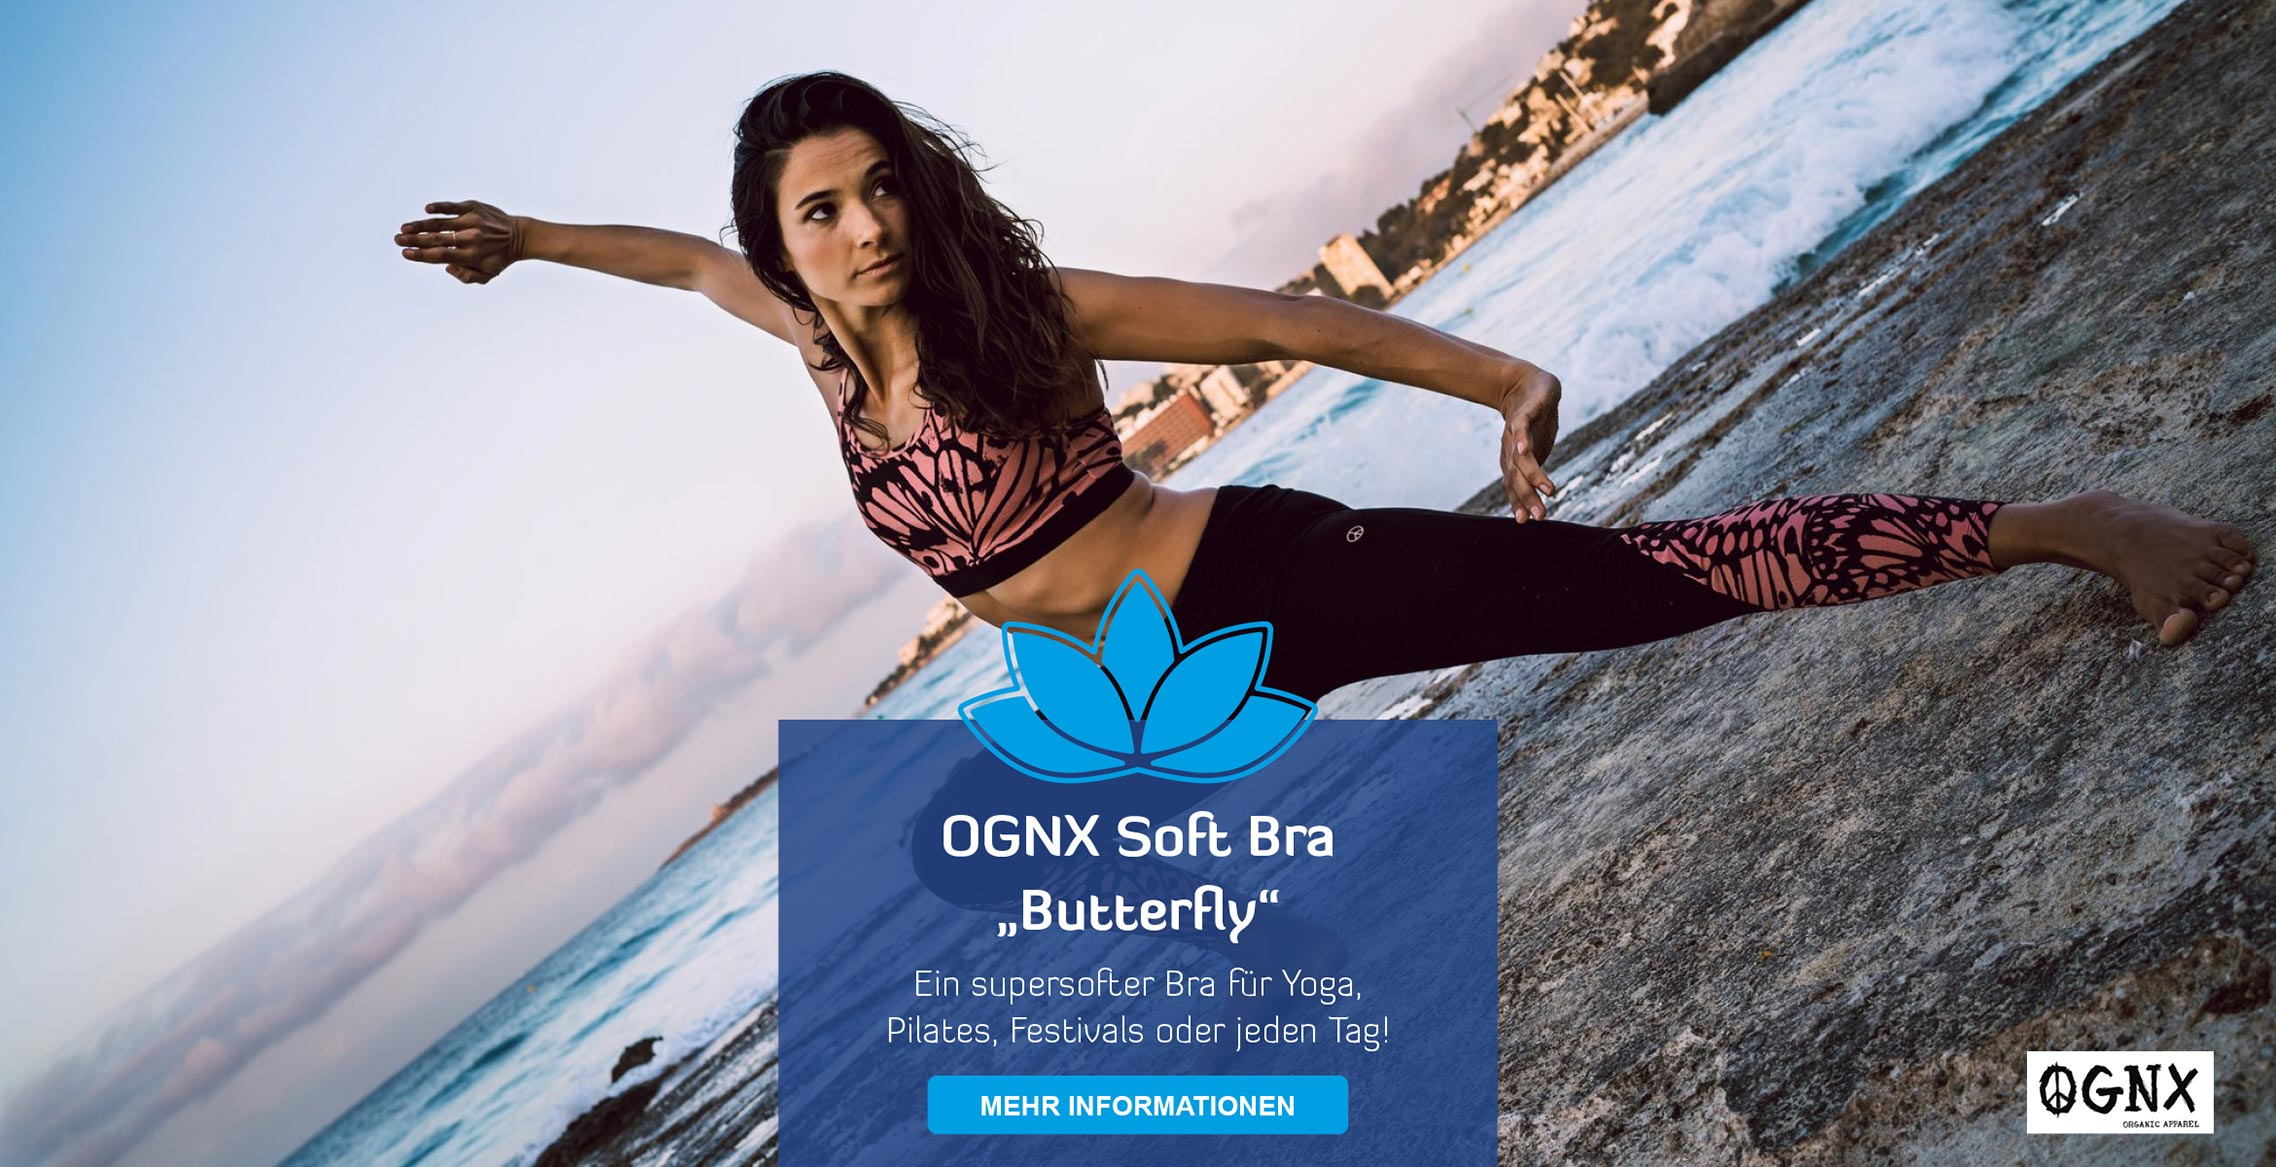 OGNX Soft-Bra